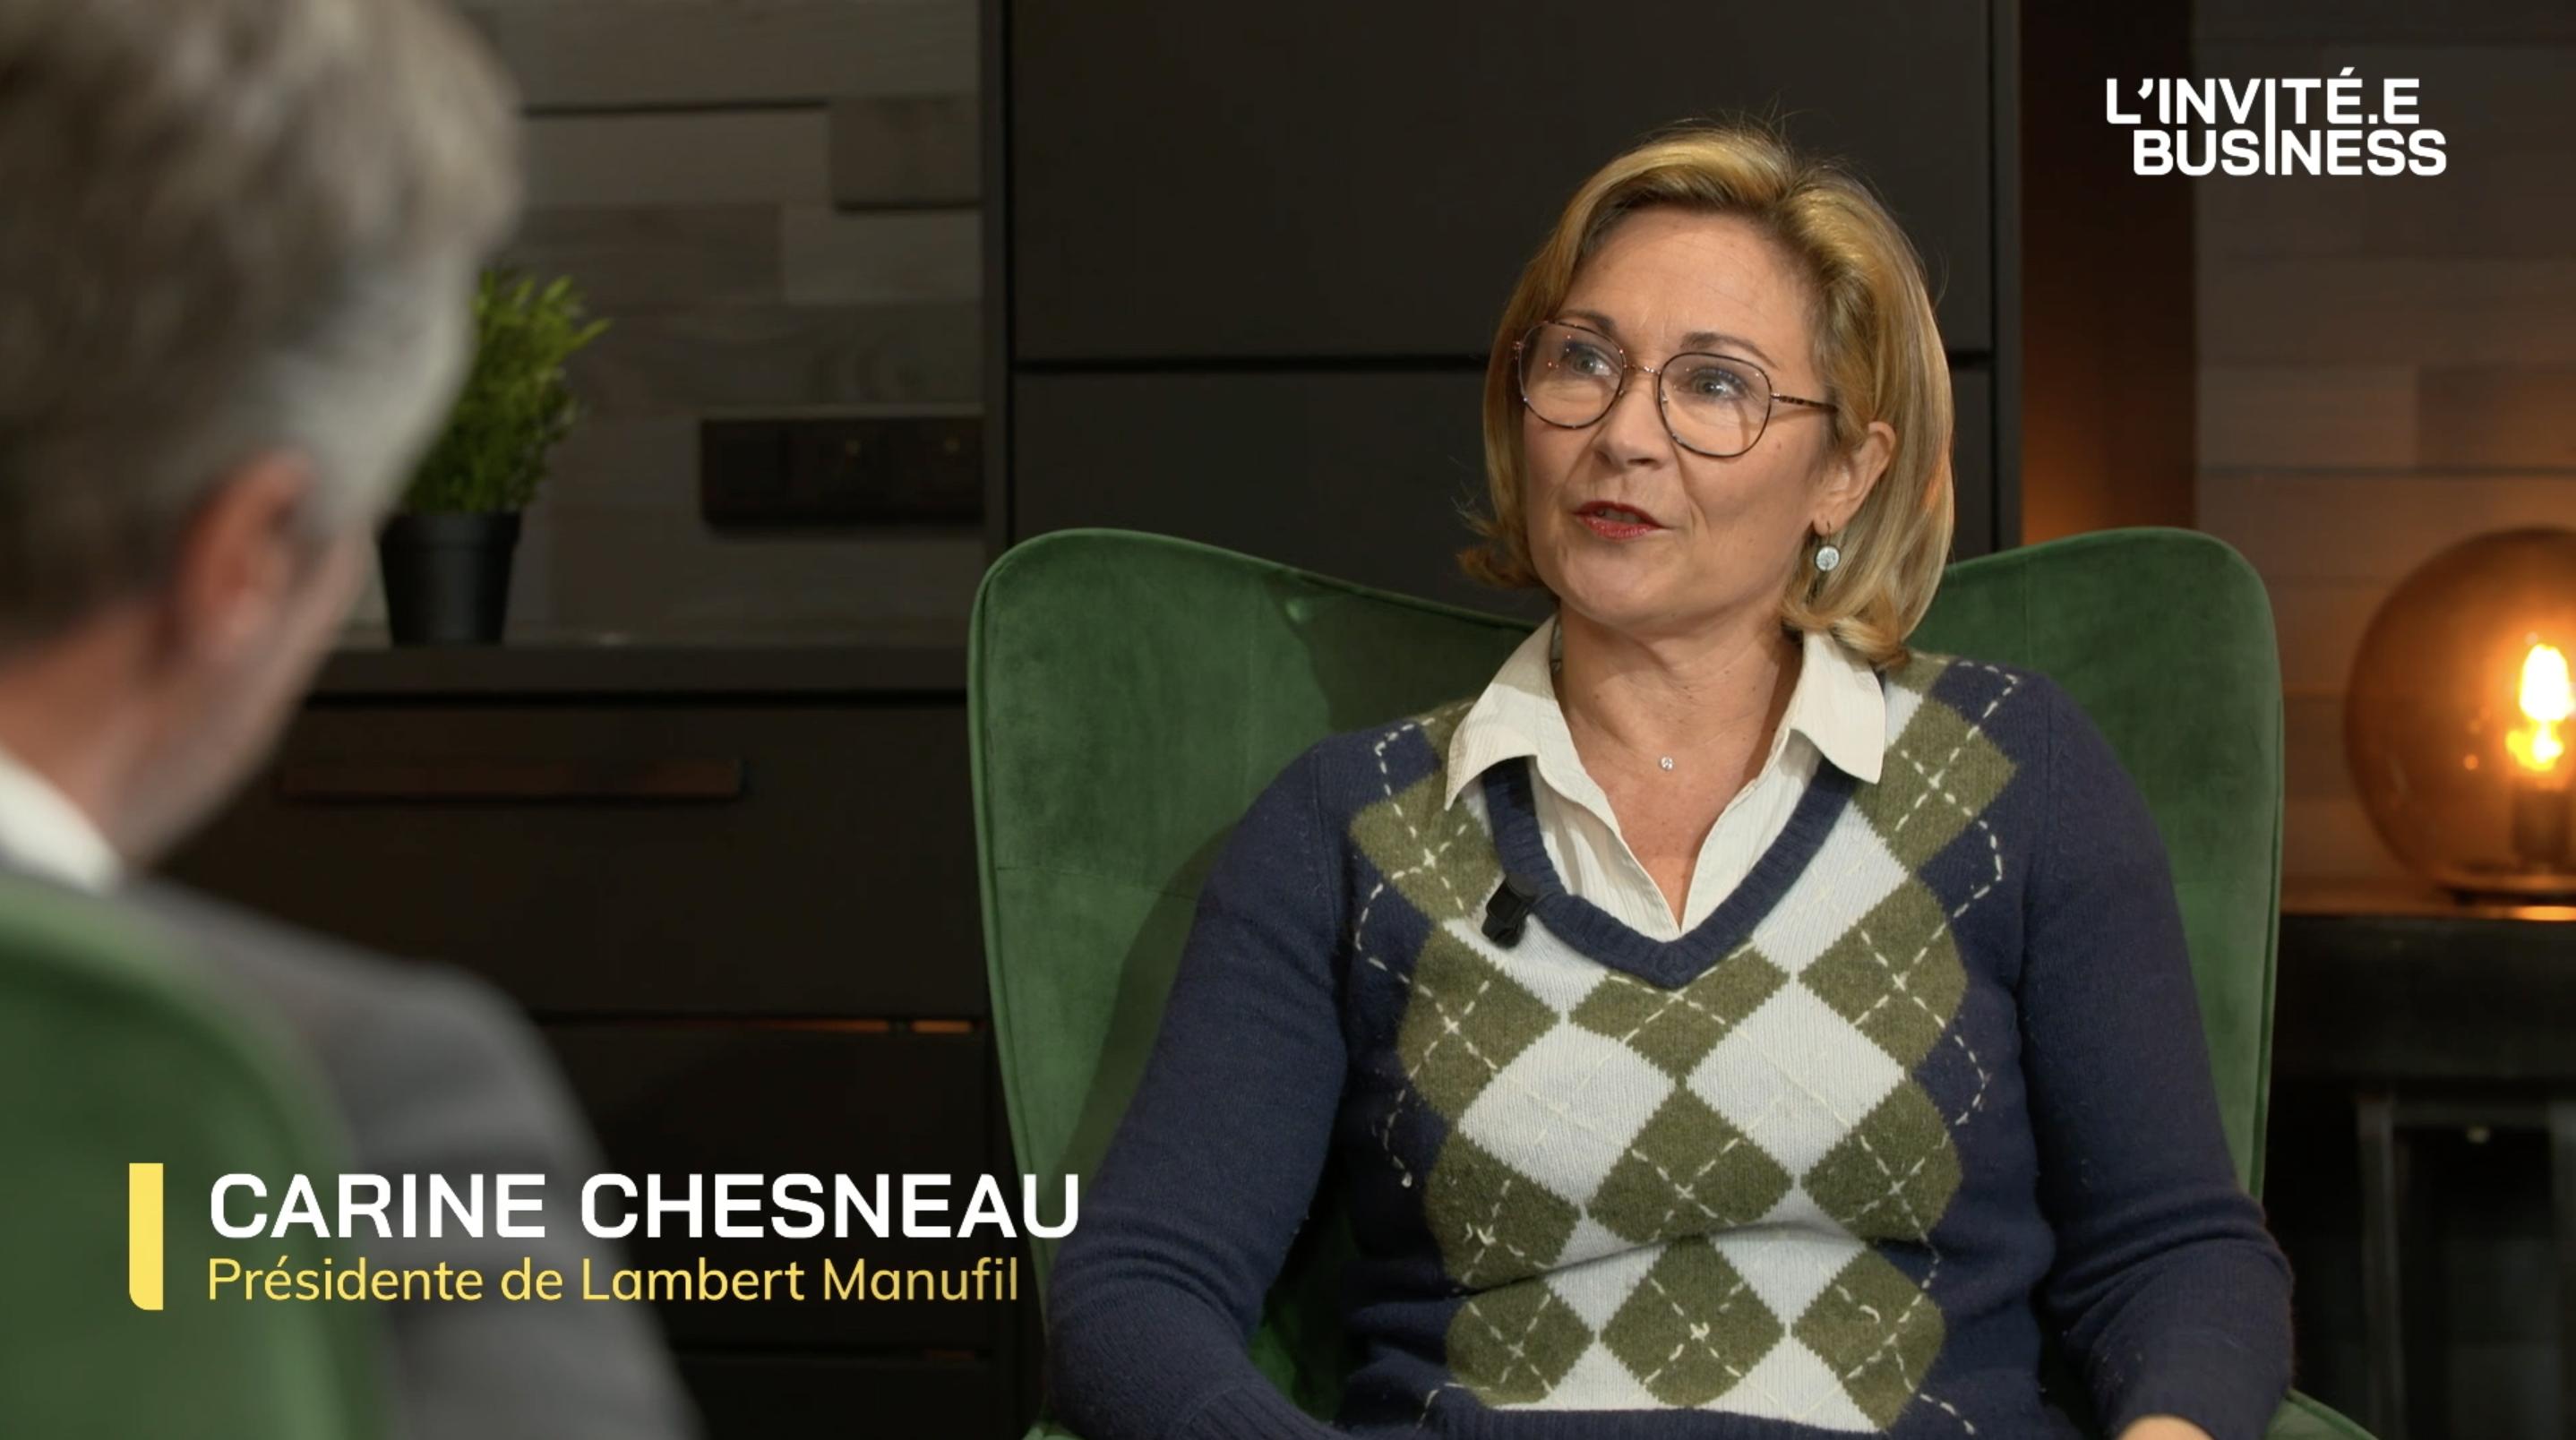 Carine Chesneau, Présidente de Lambert-Manufil